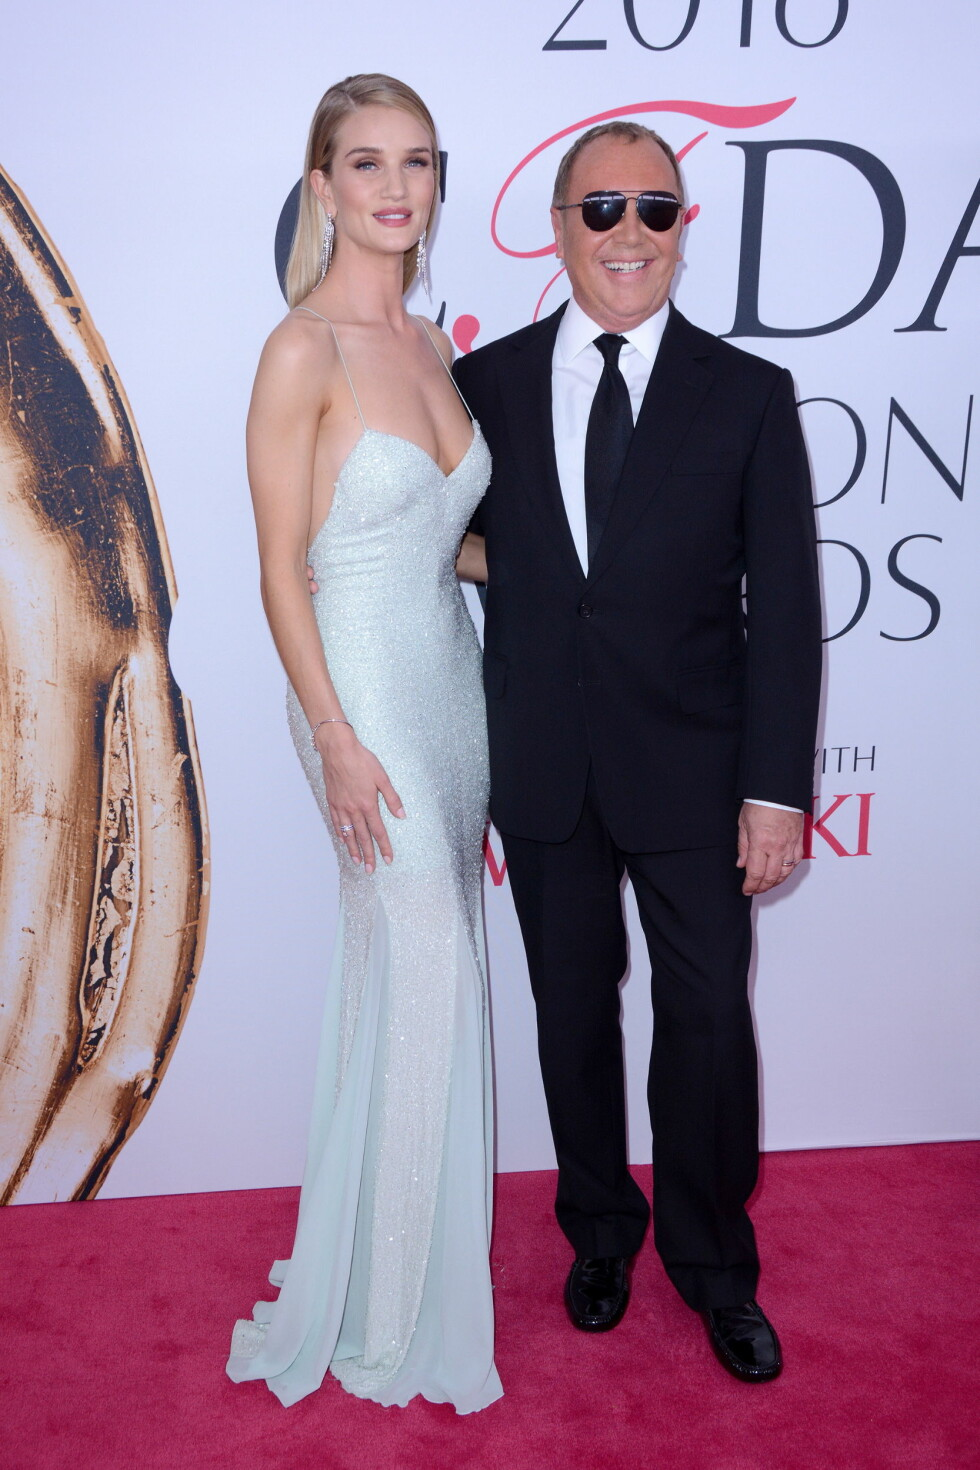 CFDA FASHION AWARDS: Rosie Huntington-Whiteley og Michael Kors. Foto: wenn.com